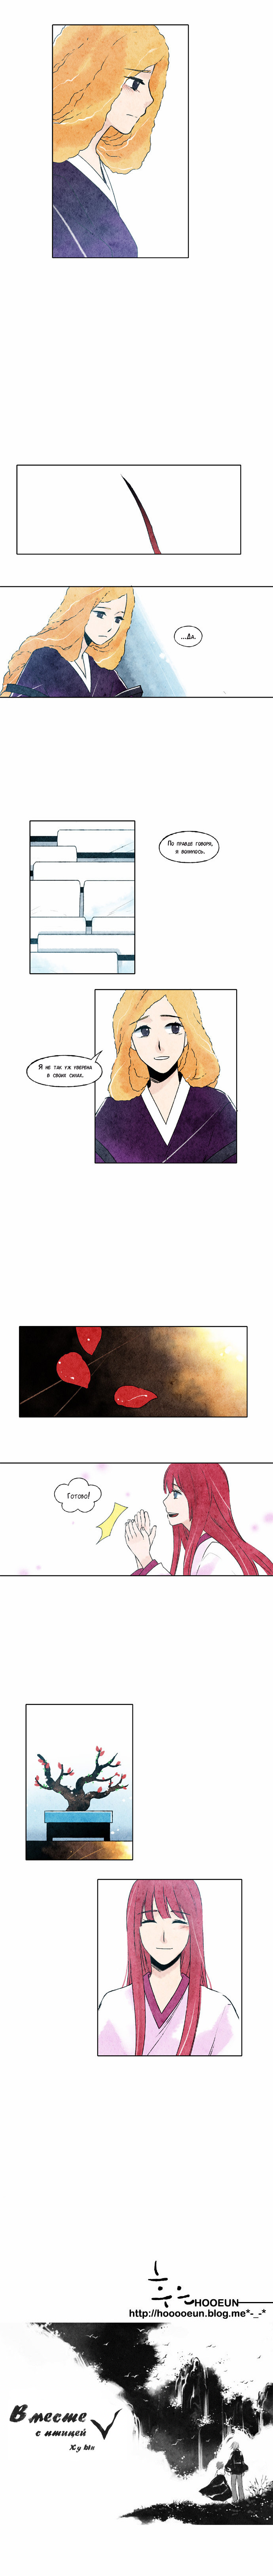 https://r1.ninemanga.com/comics/pic2/39/22503/416377/153288429941.jpg Page 4